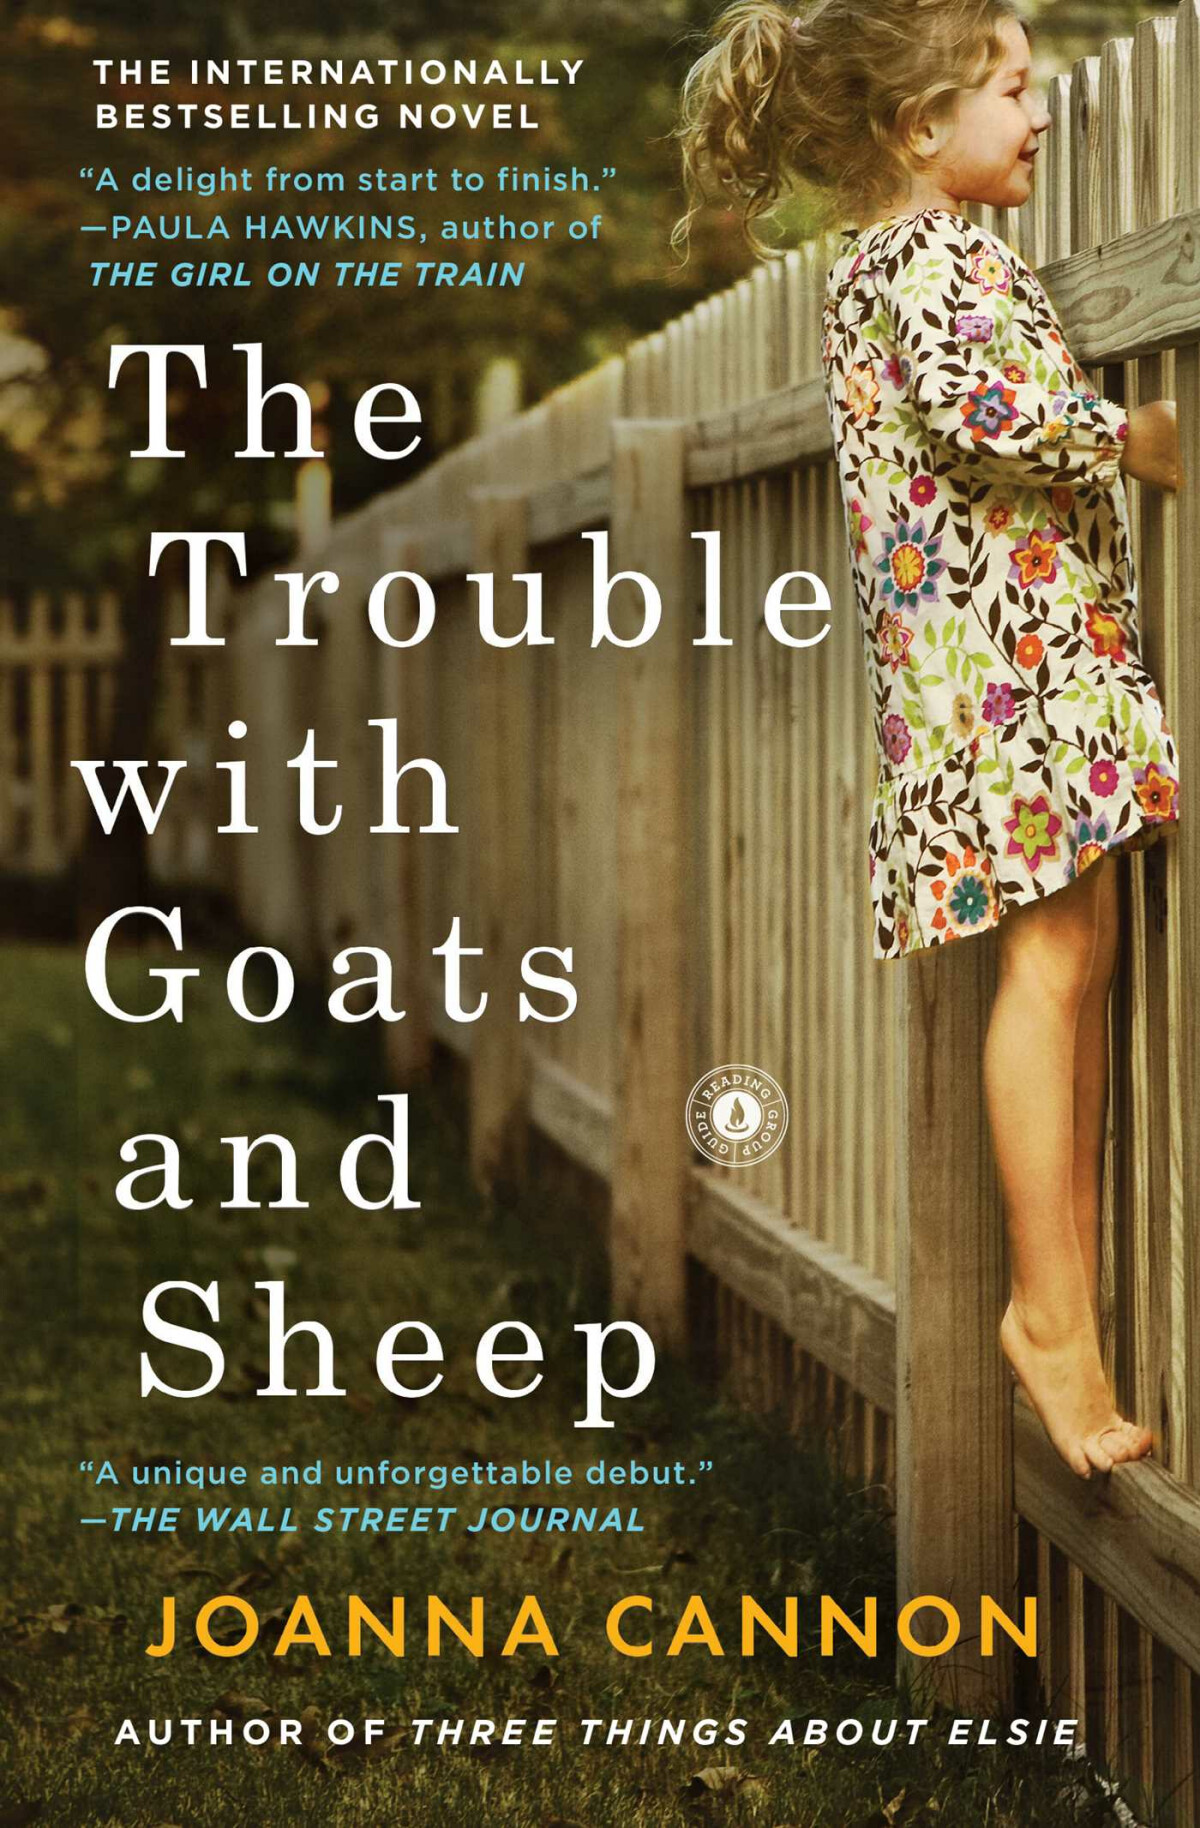 7:30 PM Good Shepherd Book Club